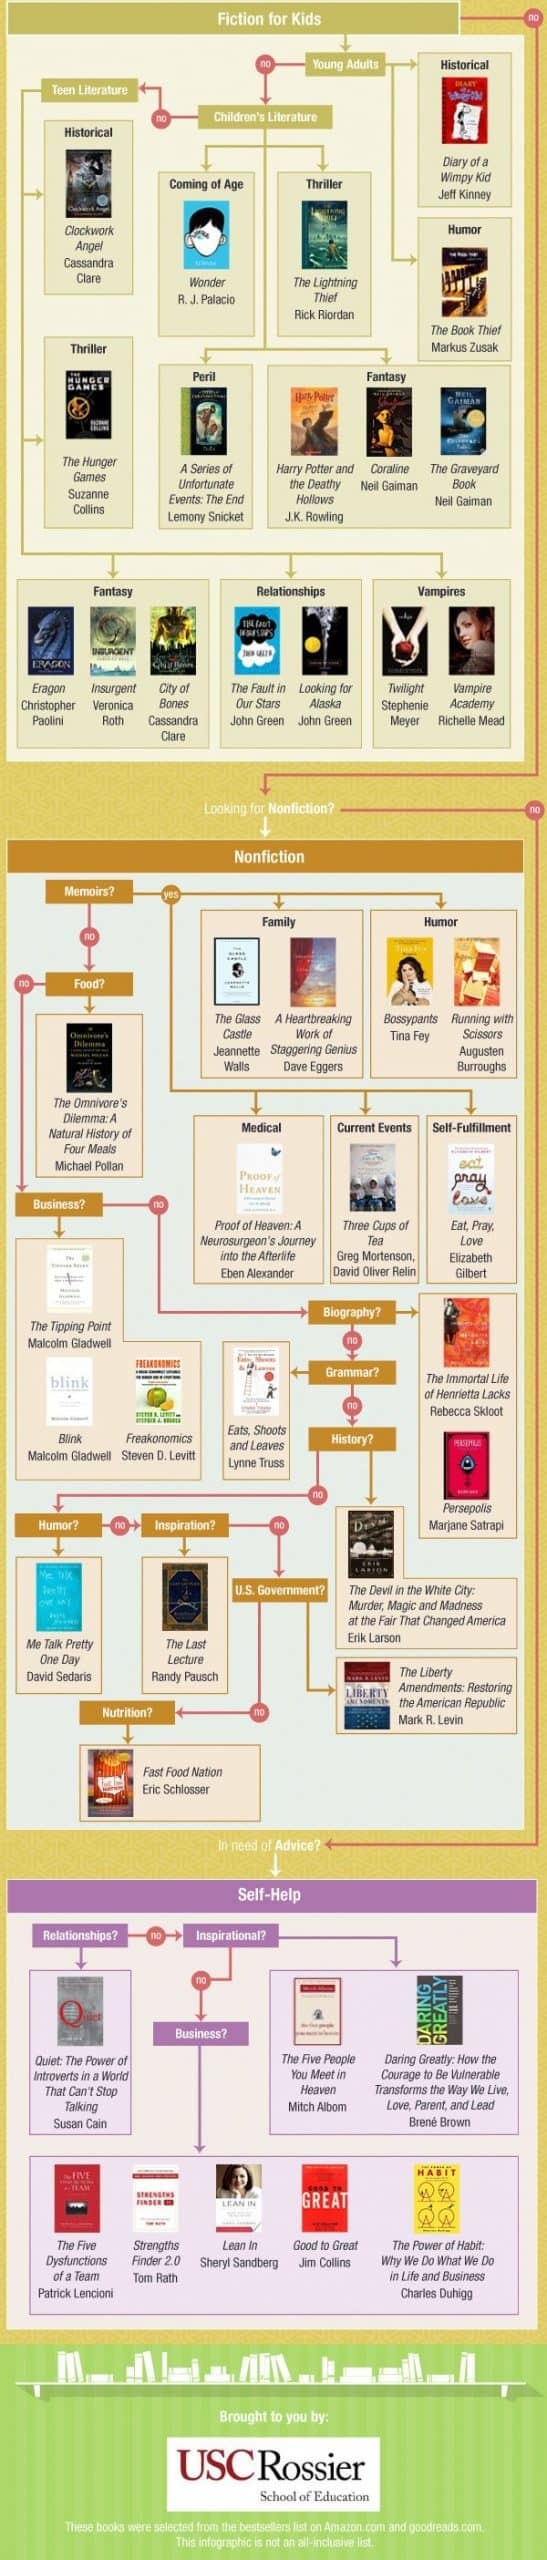 bestbooks21stcentury1